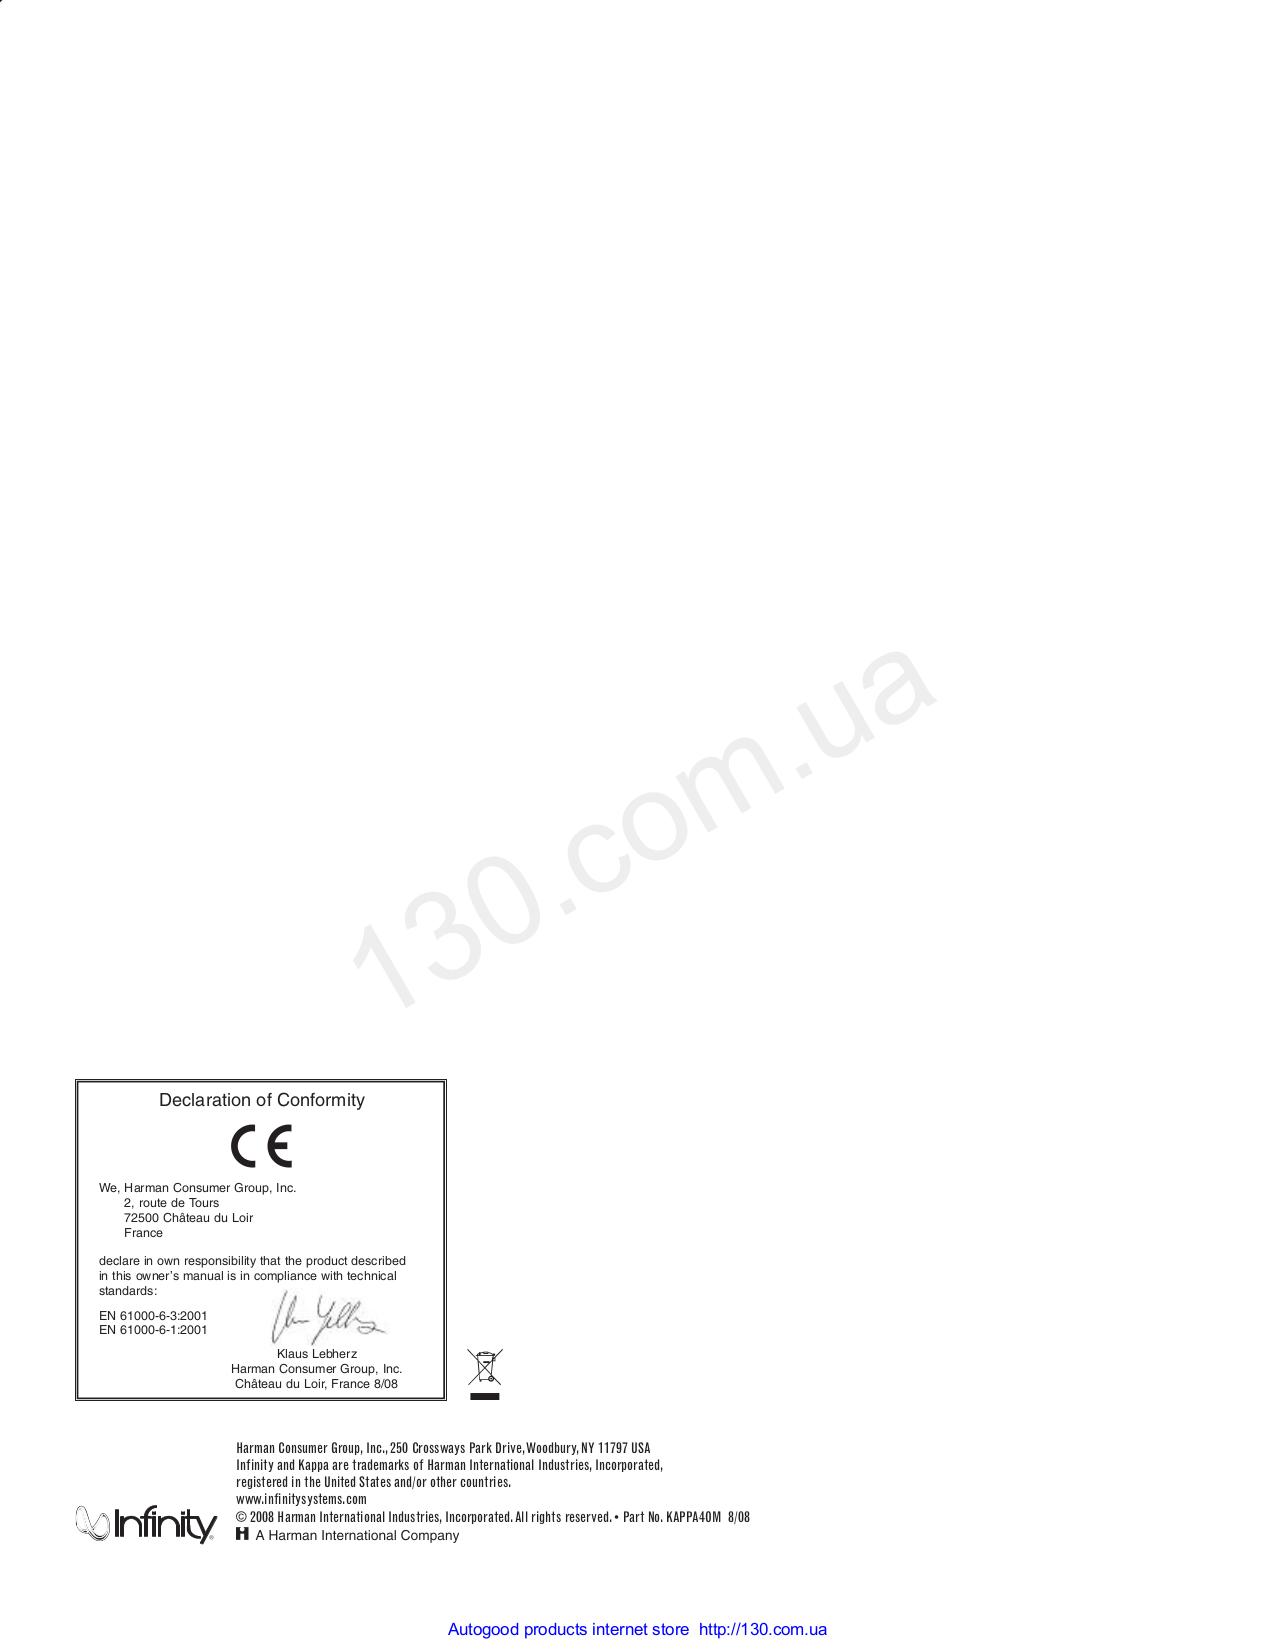 pdf manual for infinity car amplifier kappa series kappa one rh umlib com Clip Art User Guide Kindle Fire User Guide